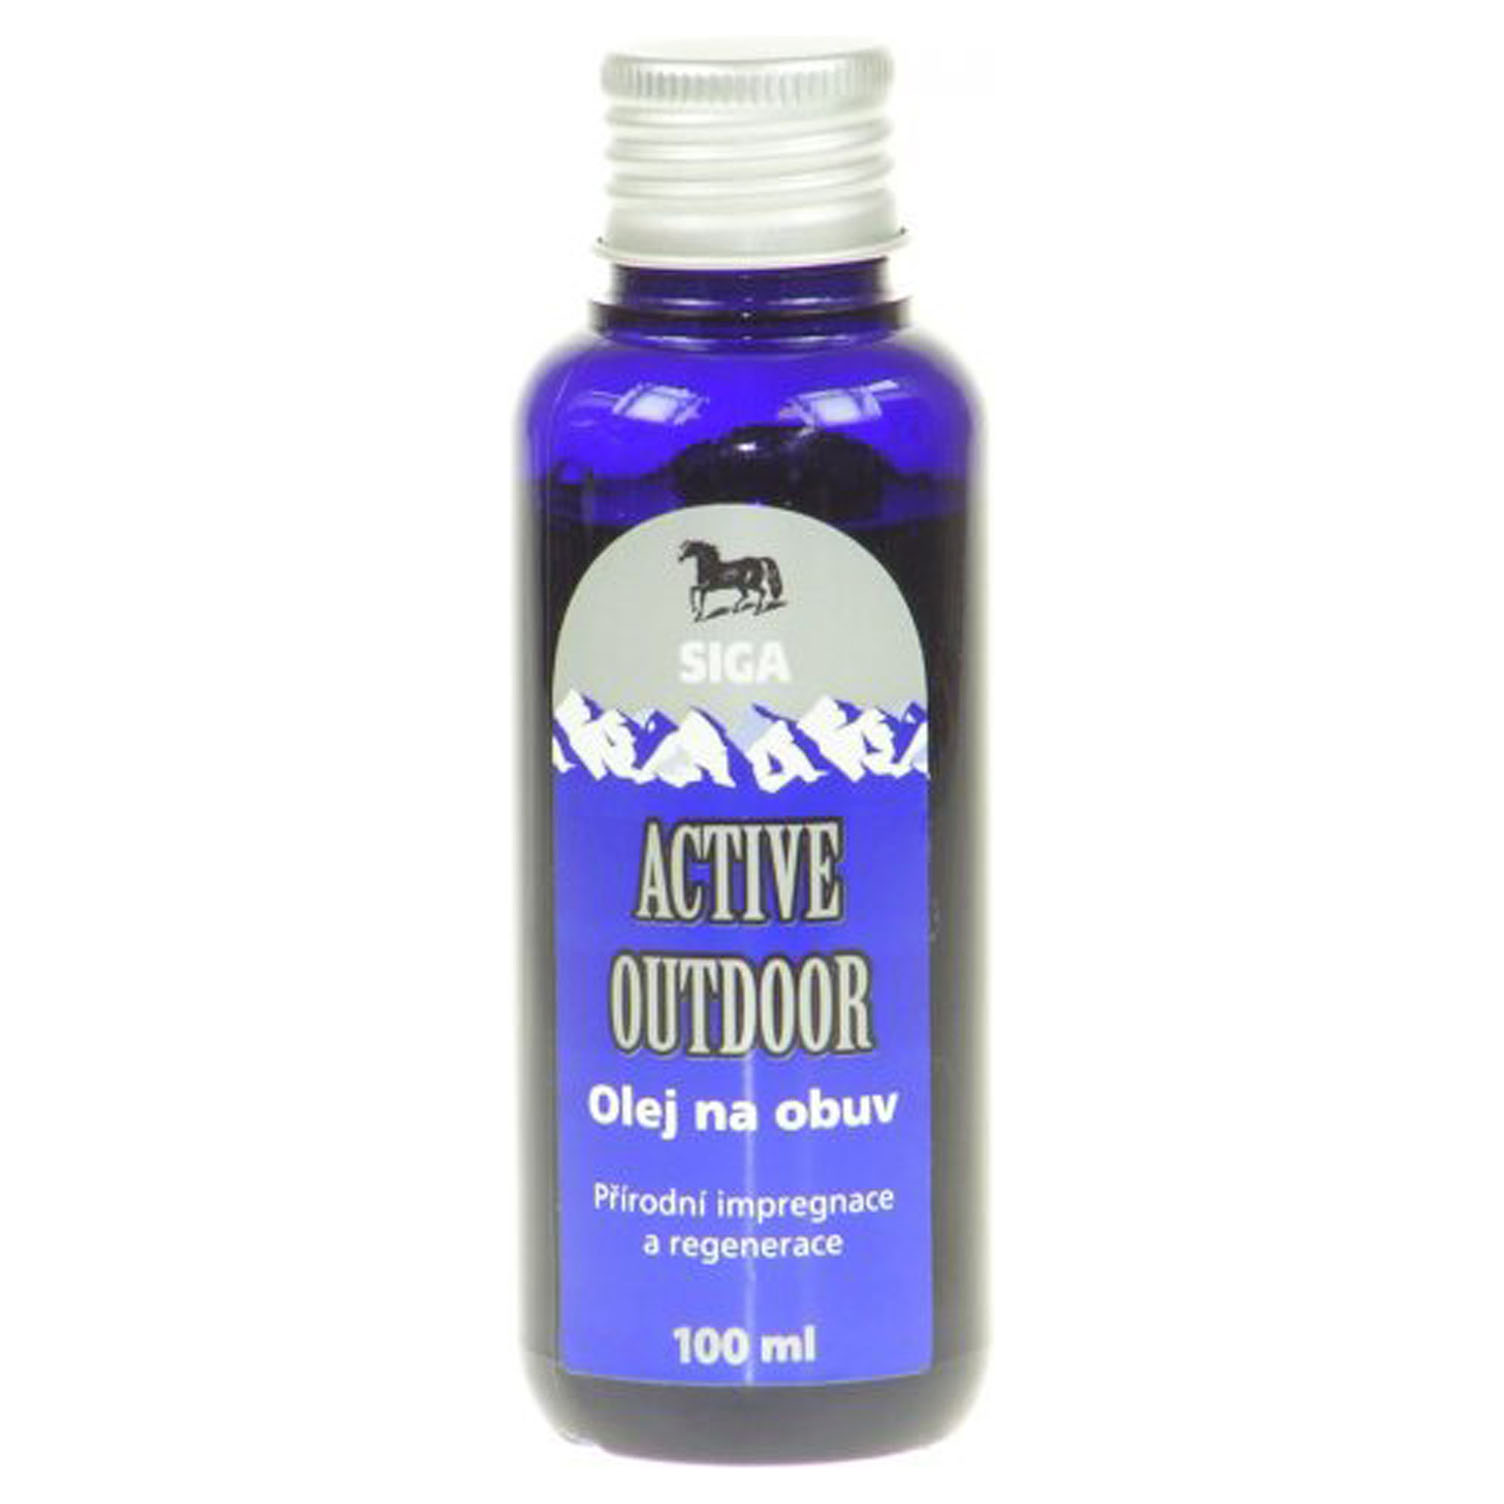 Siga Active Outdoor